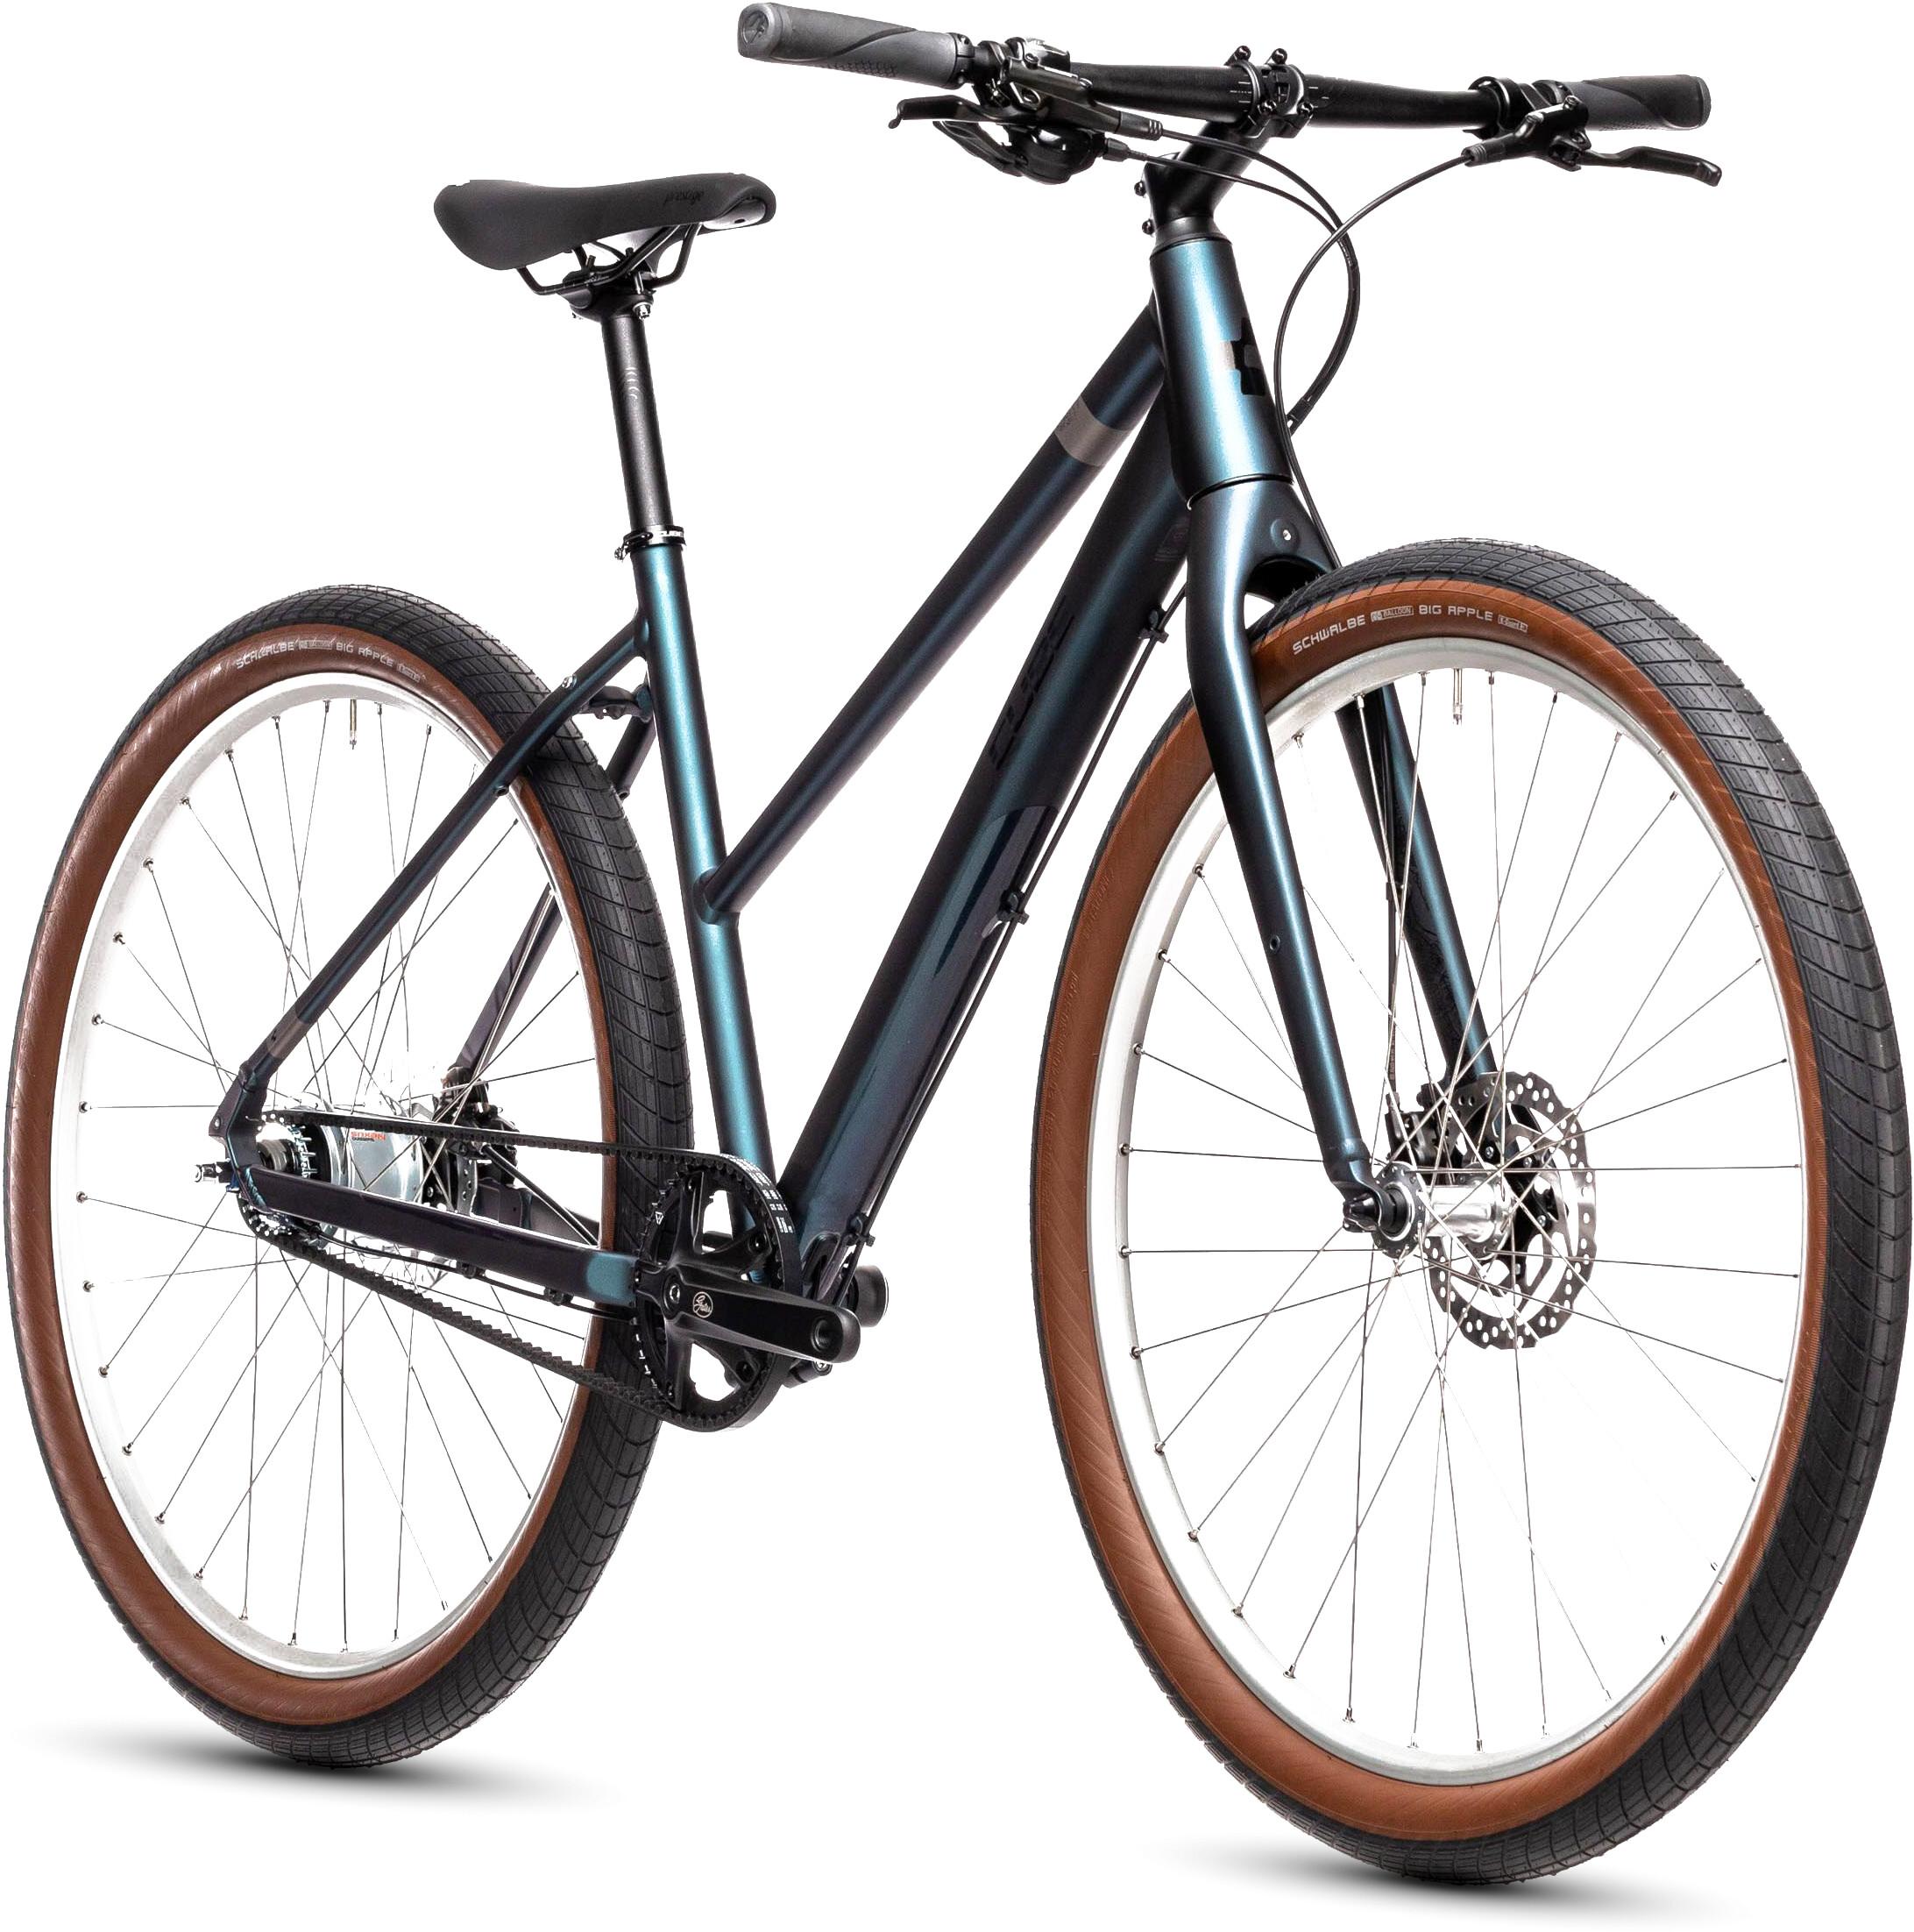 "Neuf Noir Velours Banana Seat pour Lowrider 20/"" bicyclettes"